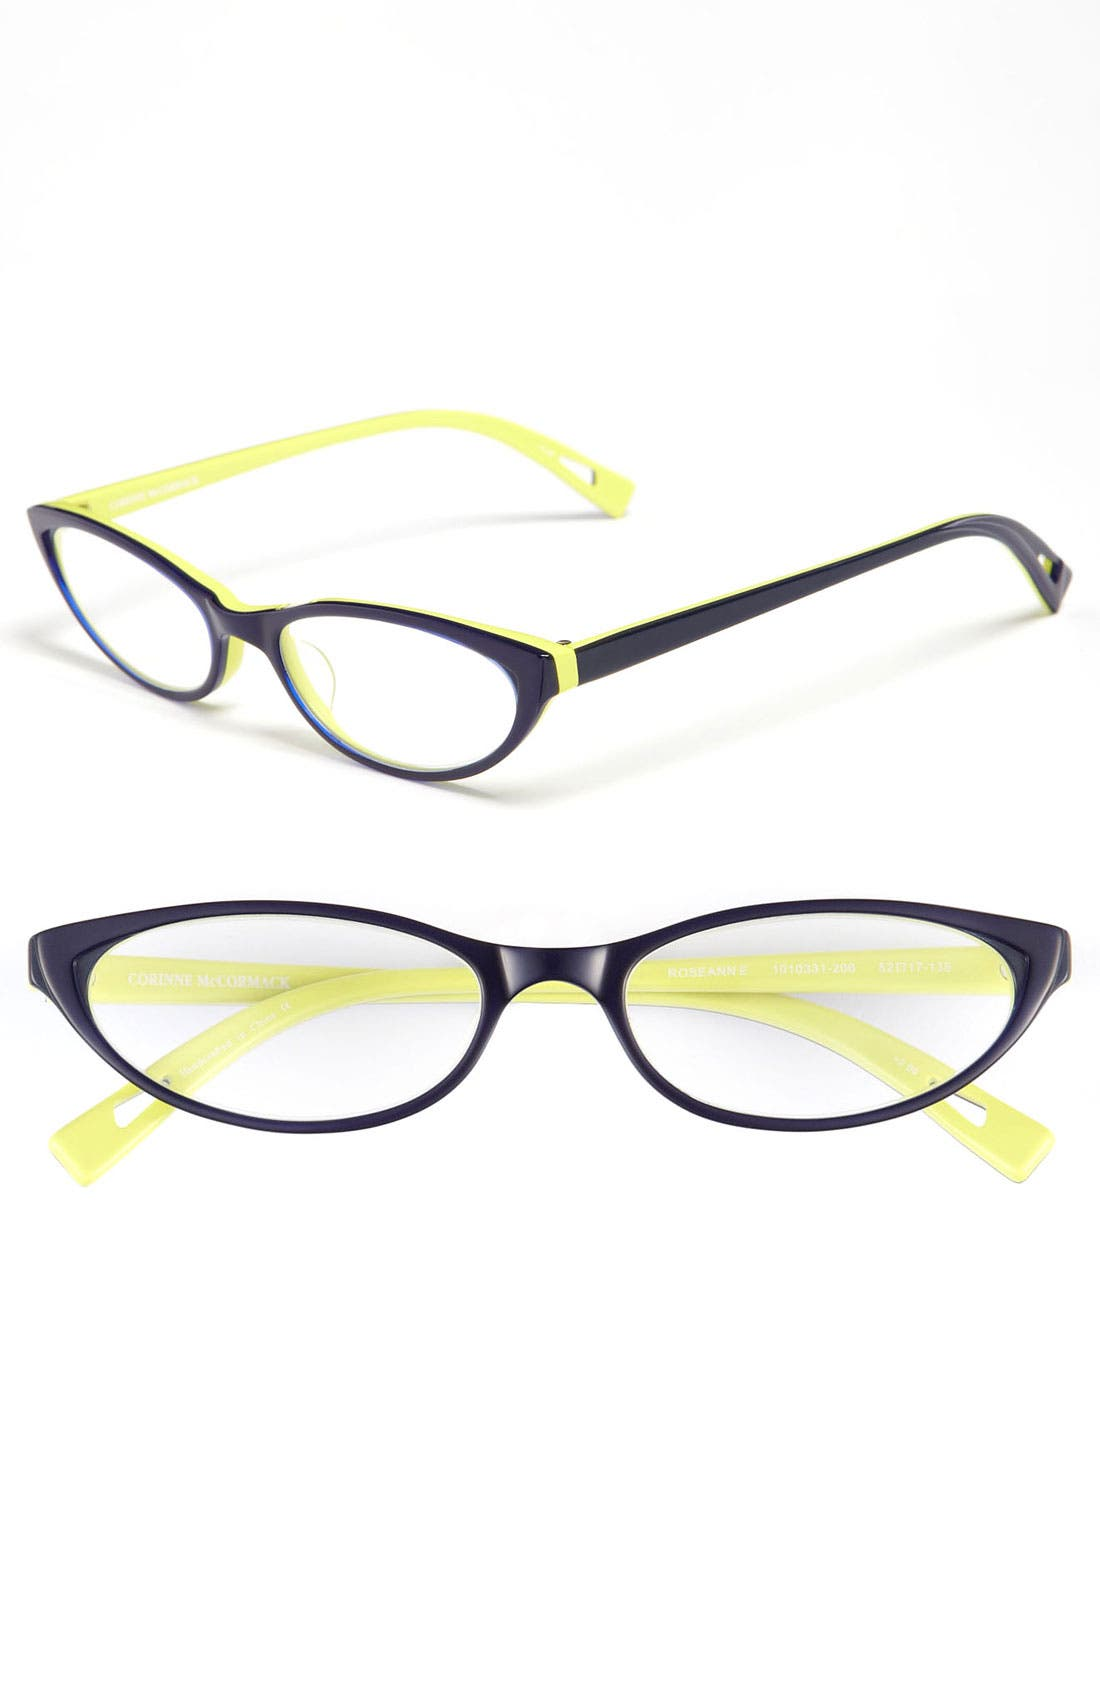 Main Image - Corinne McCormack Reading Glasses (2 for $88)